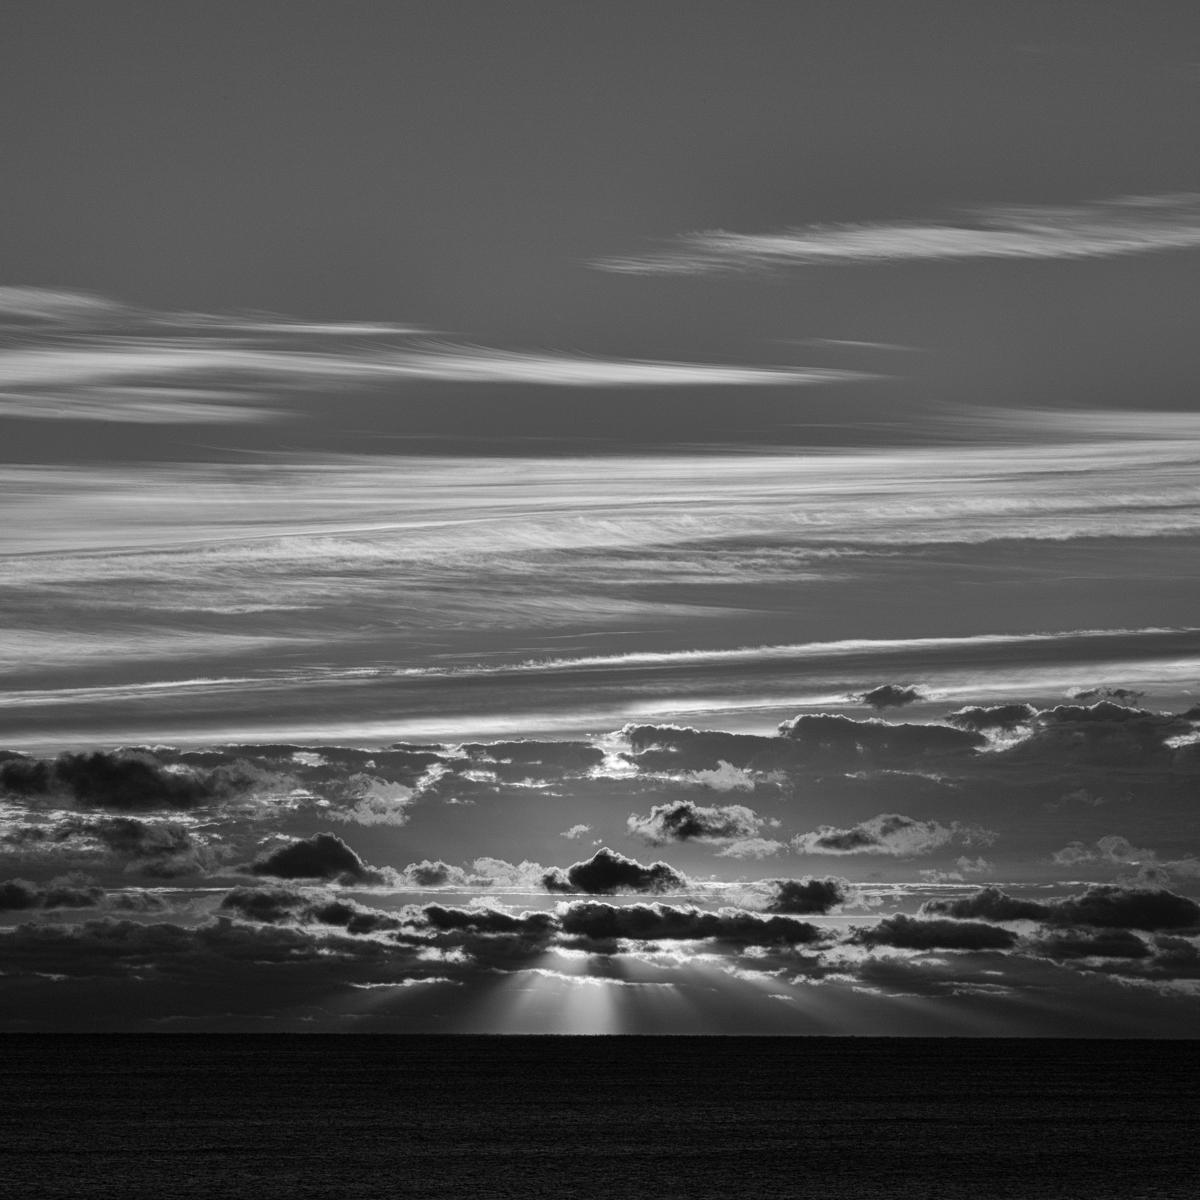 Sunrise, Hollywood - 1317, FL (large view)